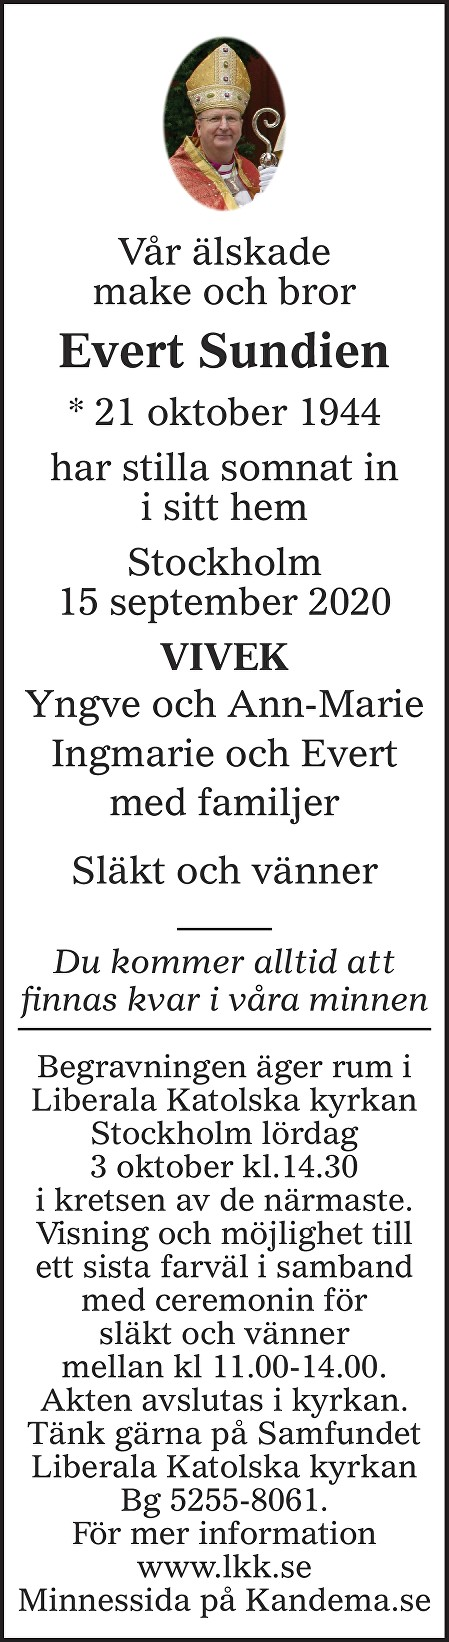 Evert Sundien Death notice